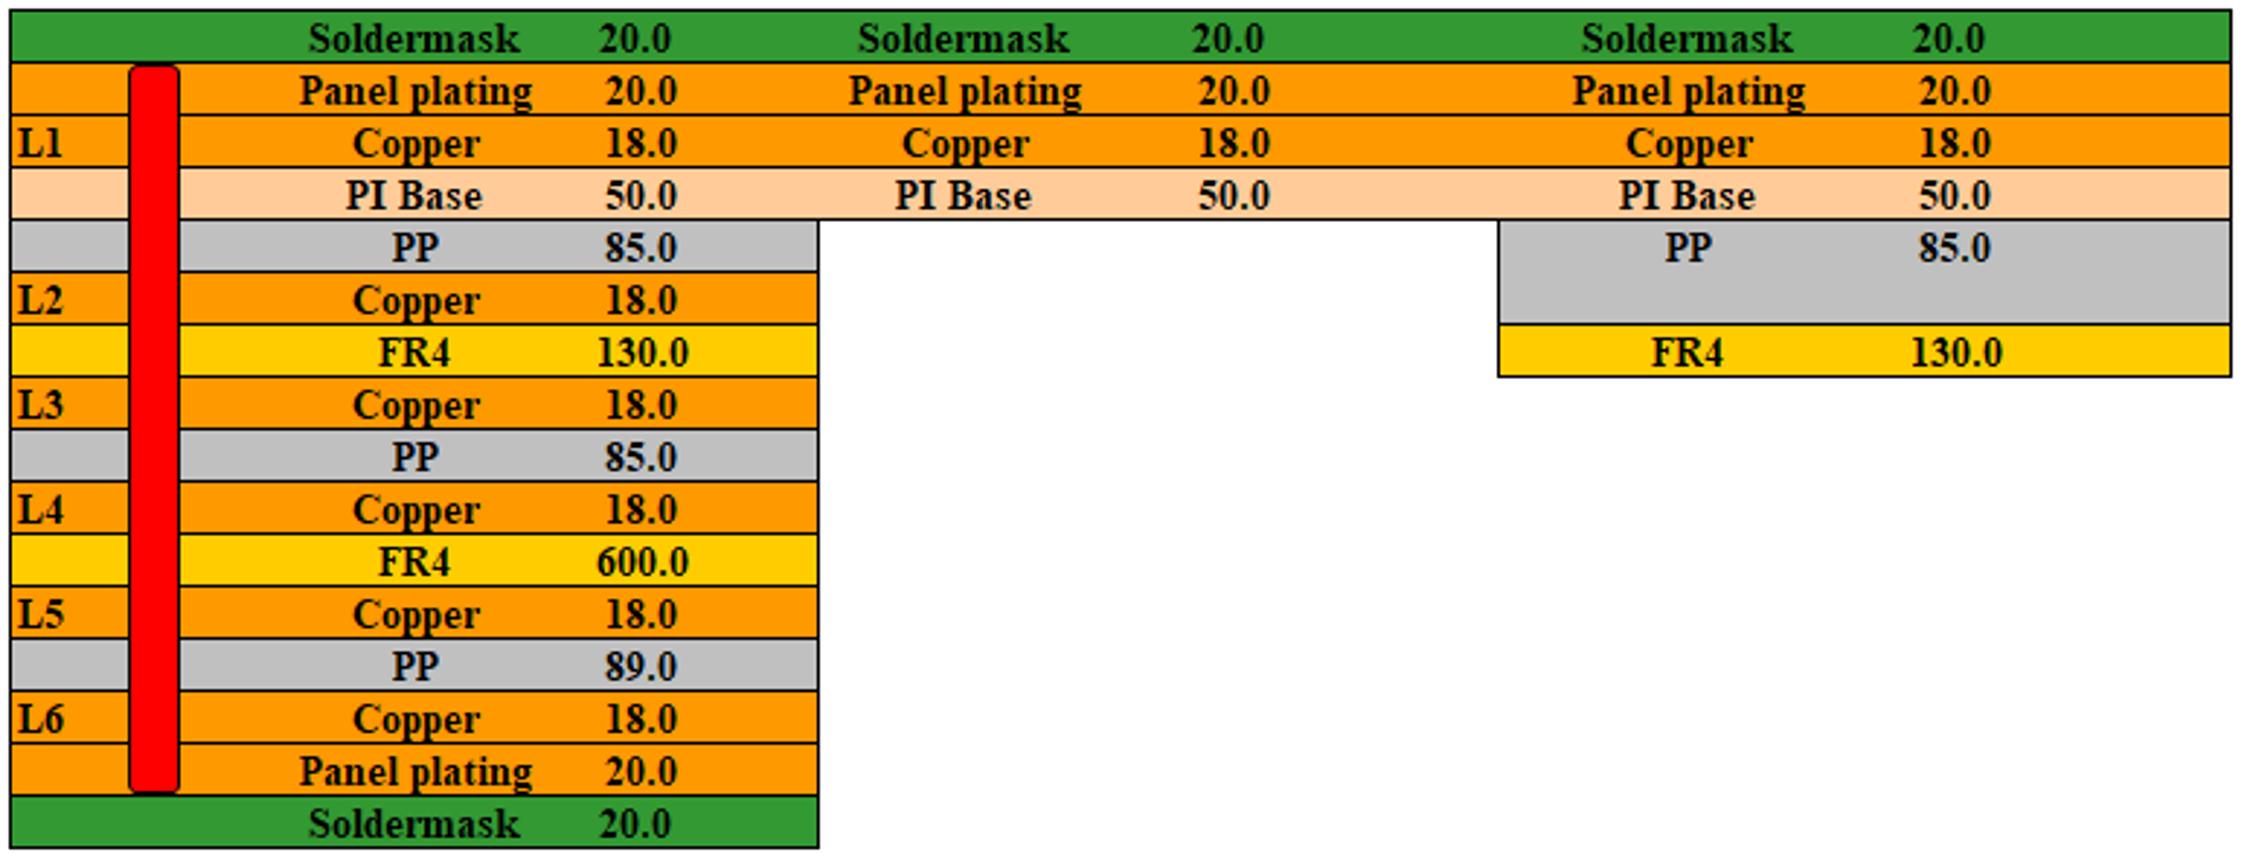 12 Lamination structure rigid flex PCB - Rigid flexible PCB - multilayer circuit board